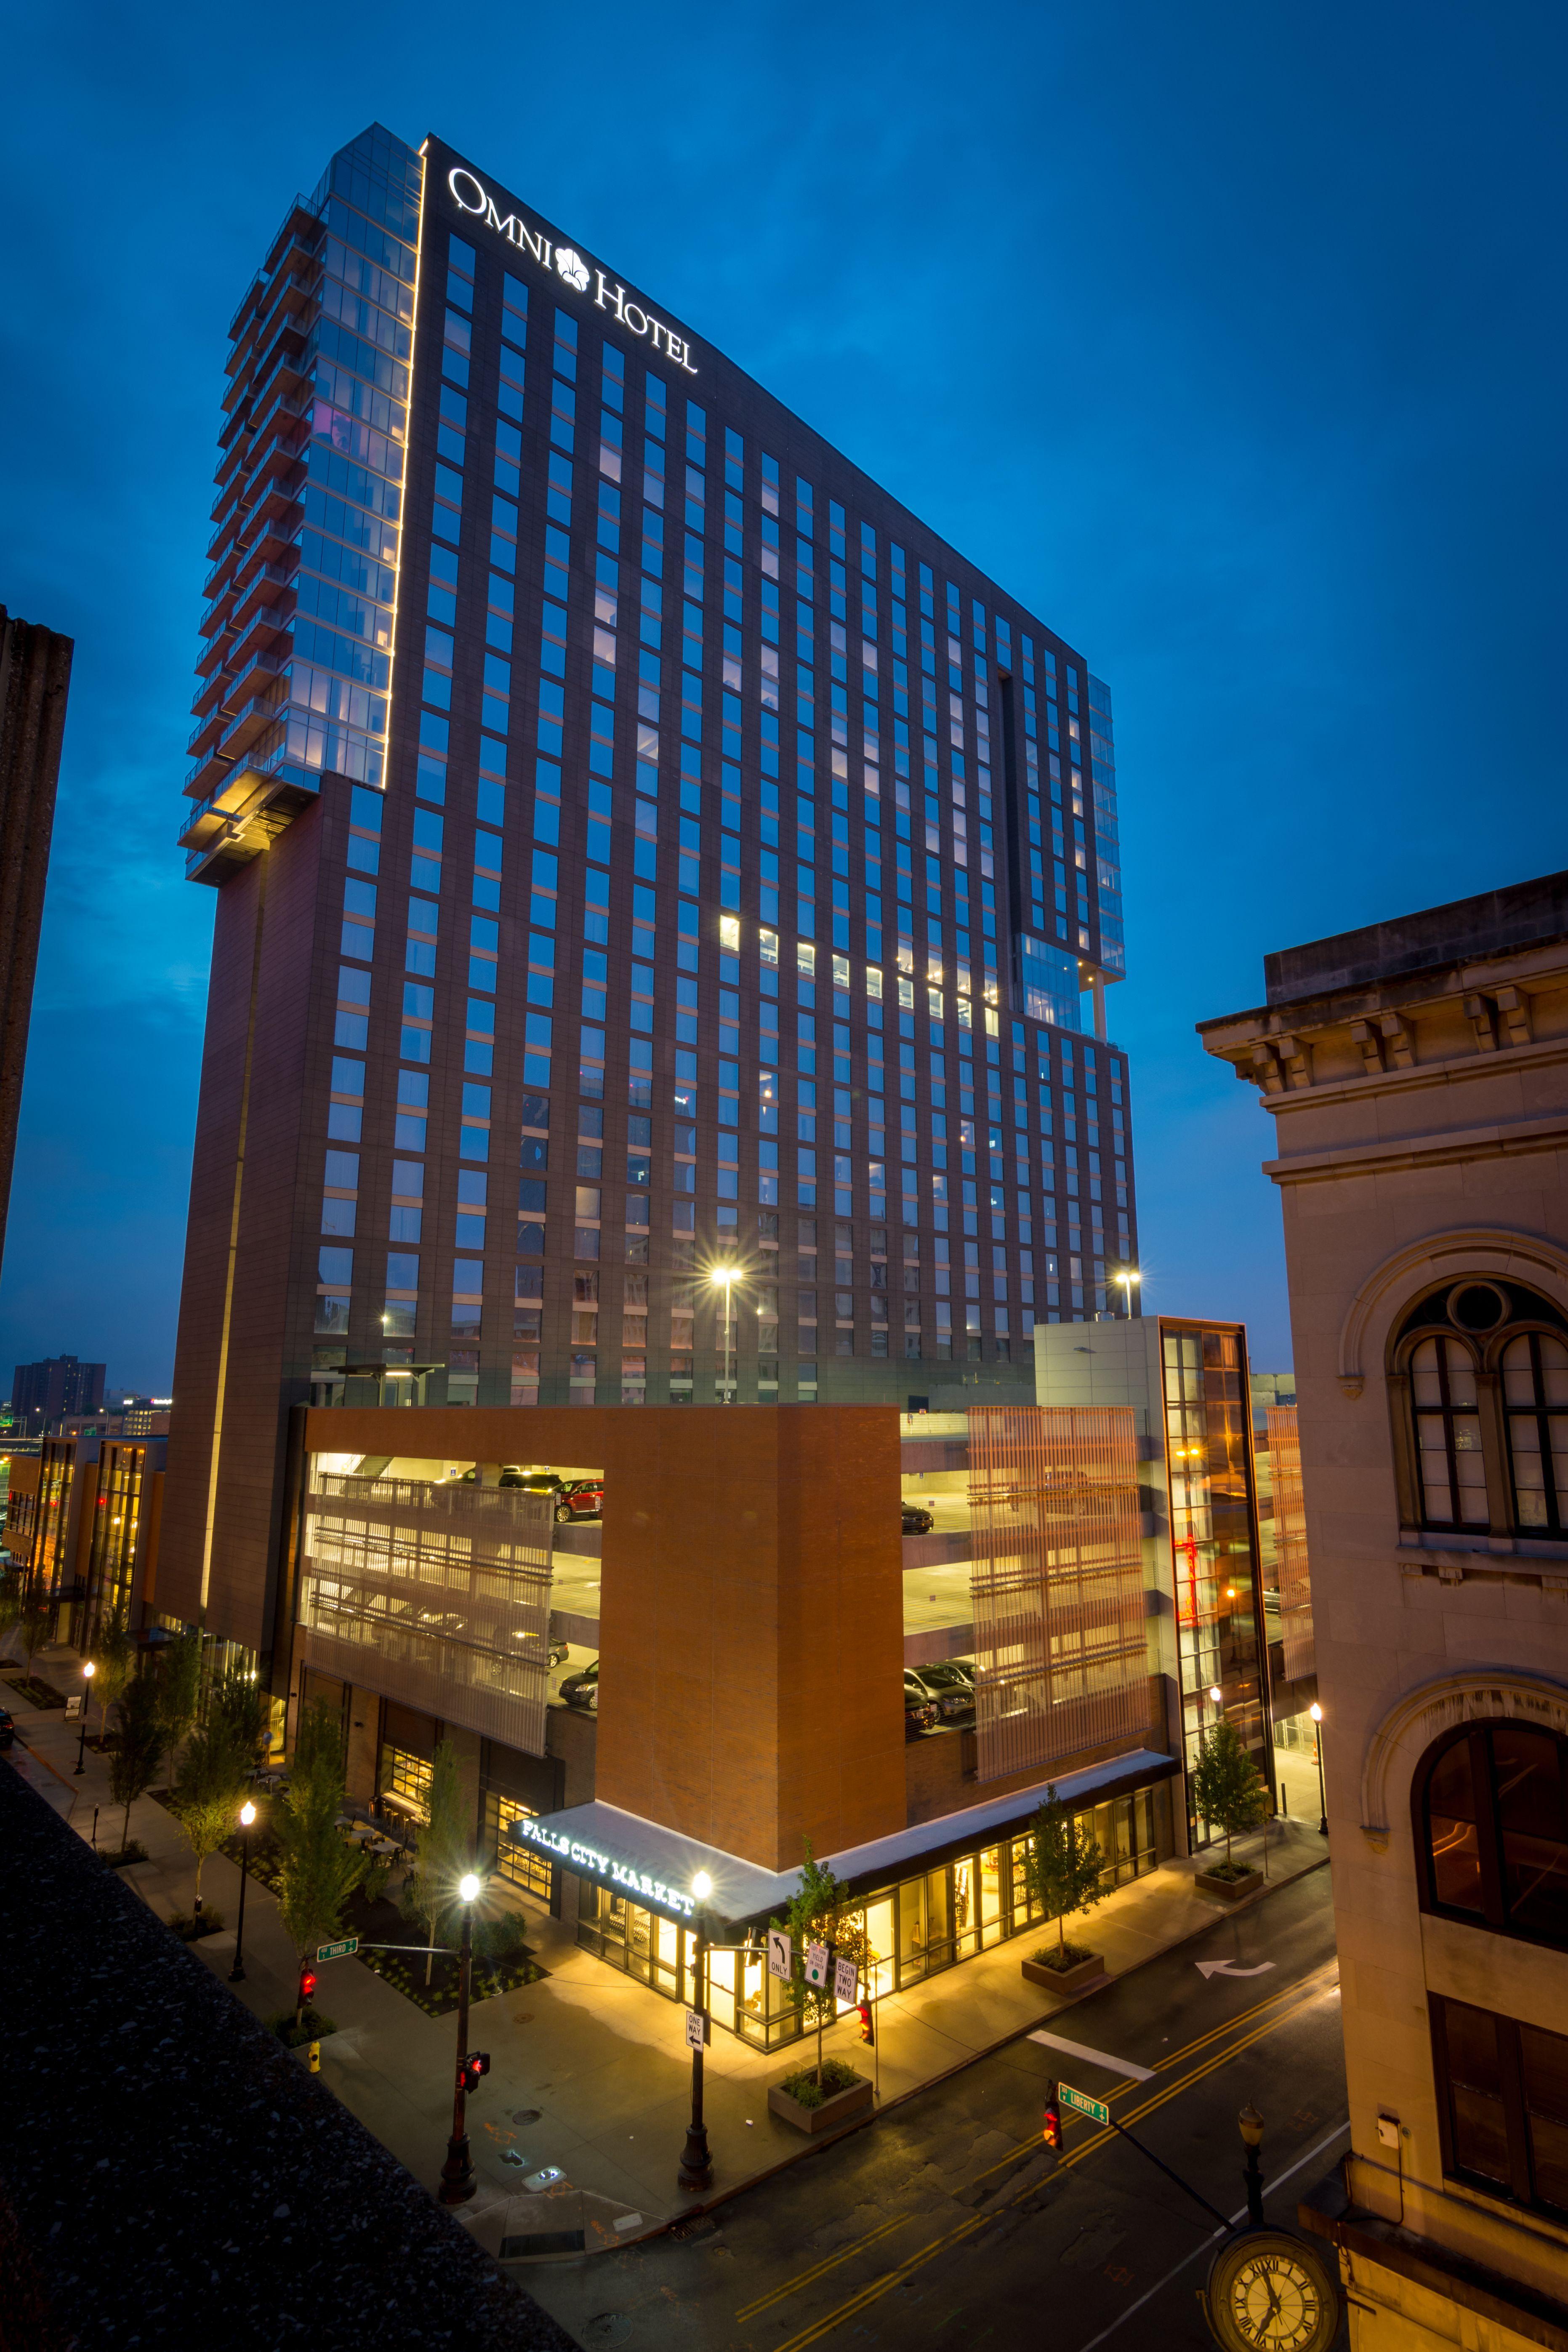 The Omni Hotel Louisville Louisville Hotels Omni Hotel